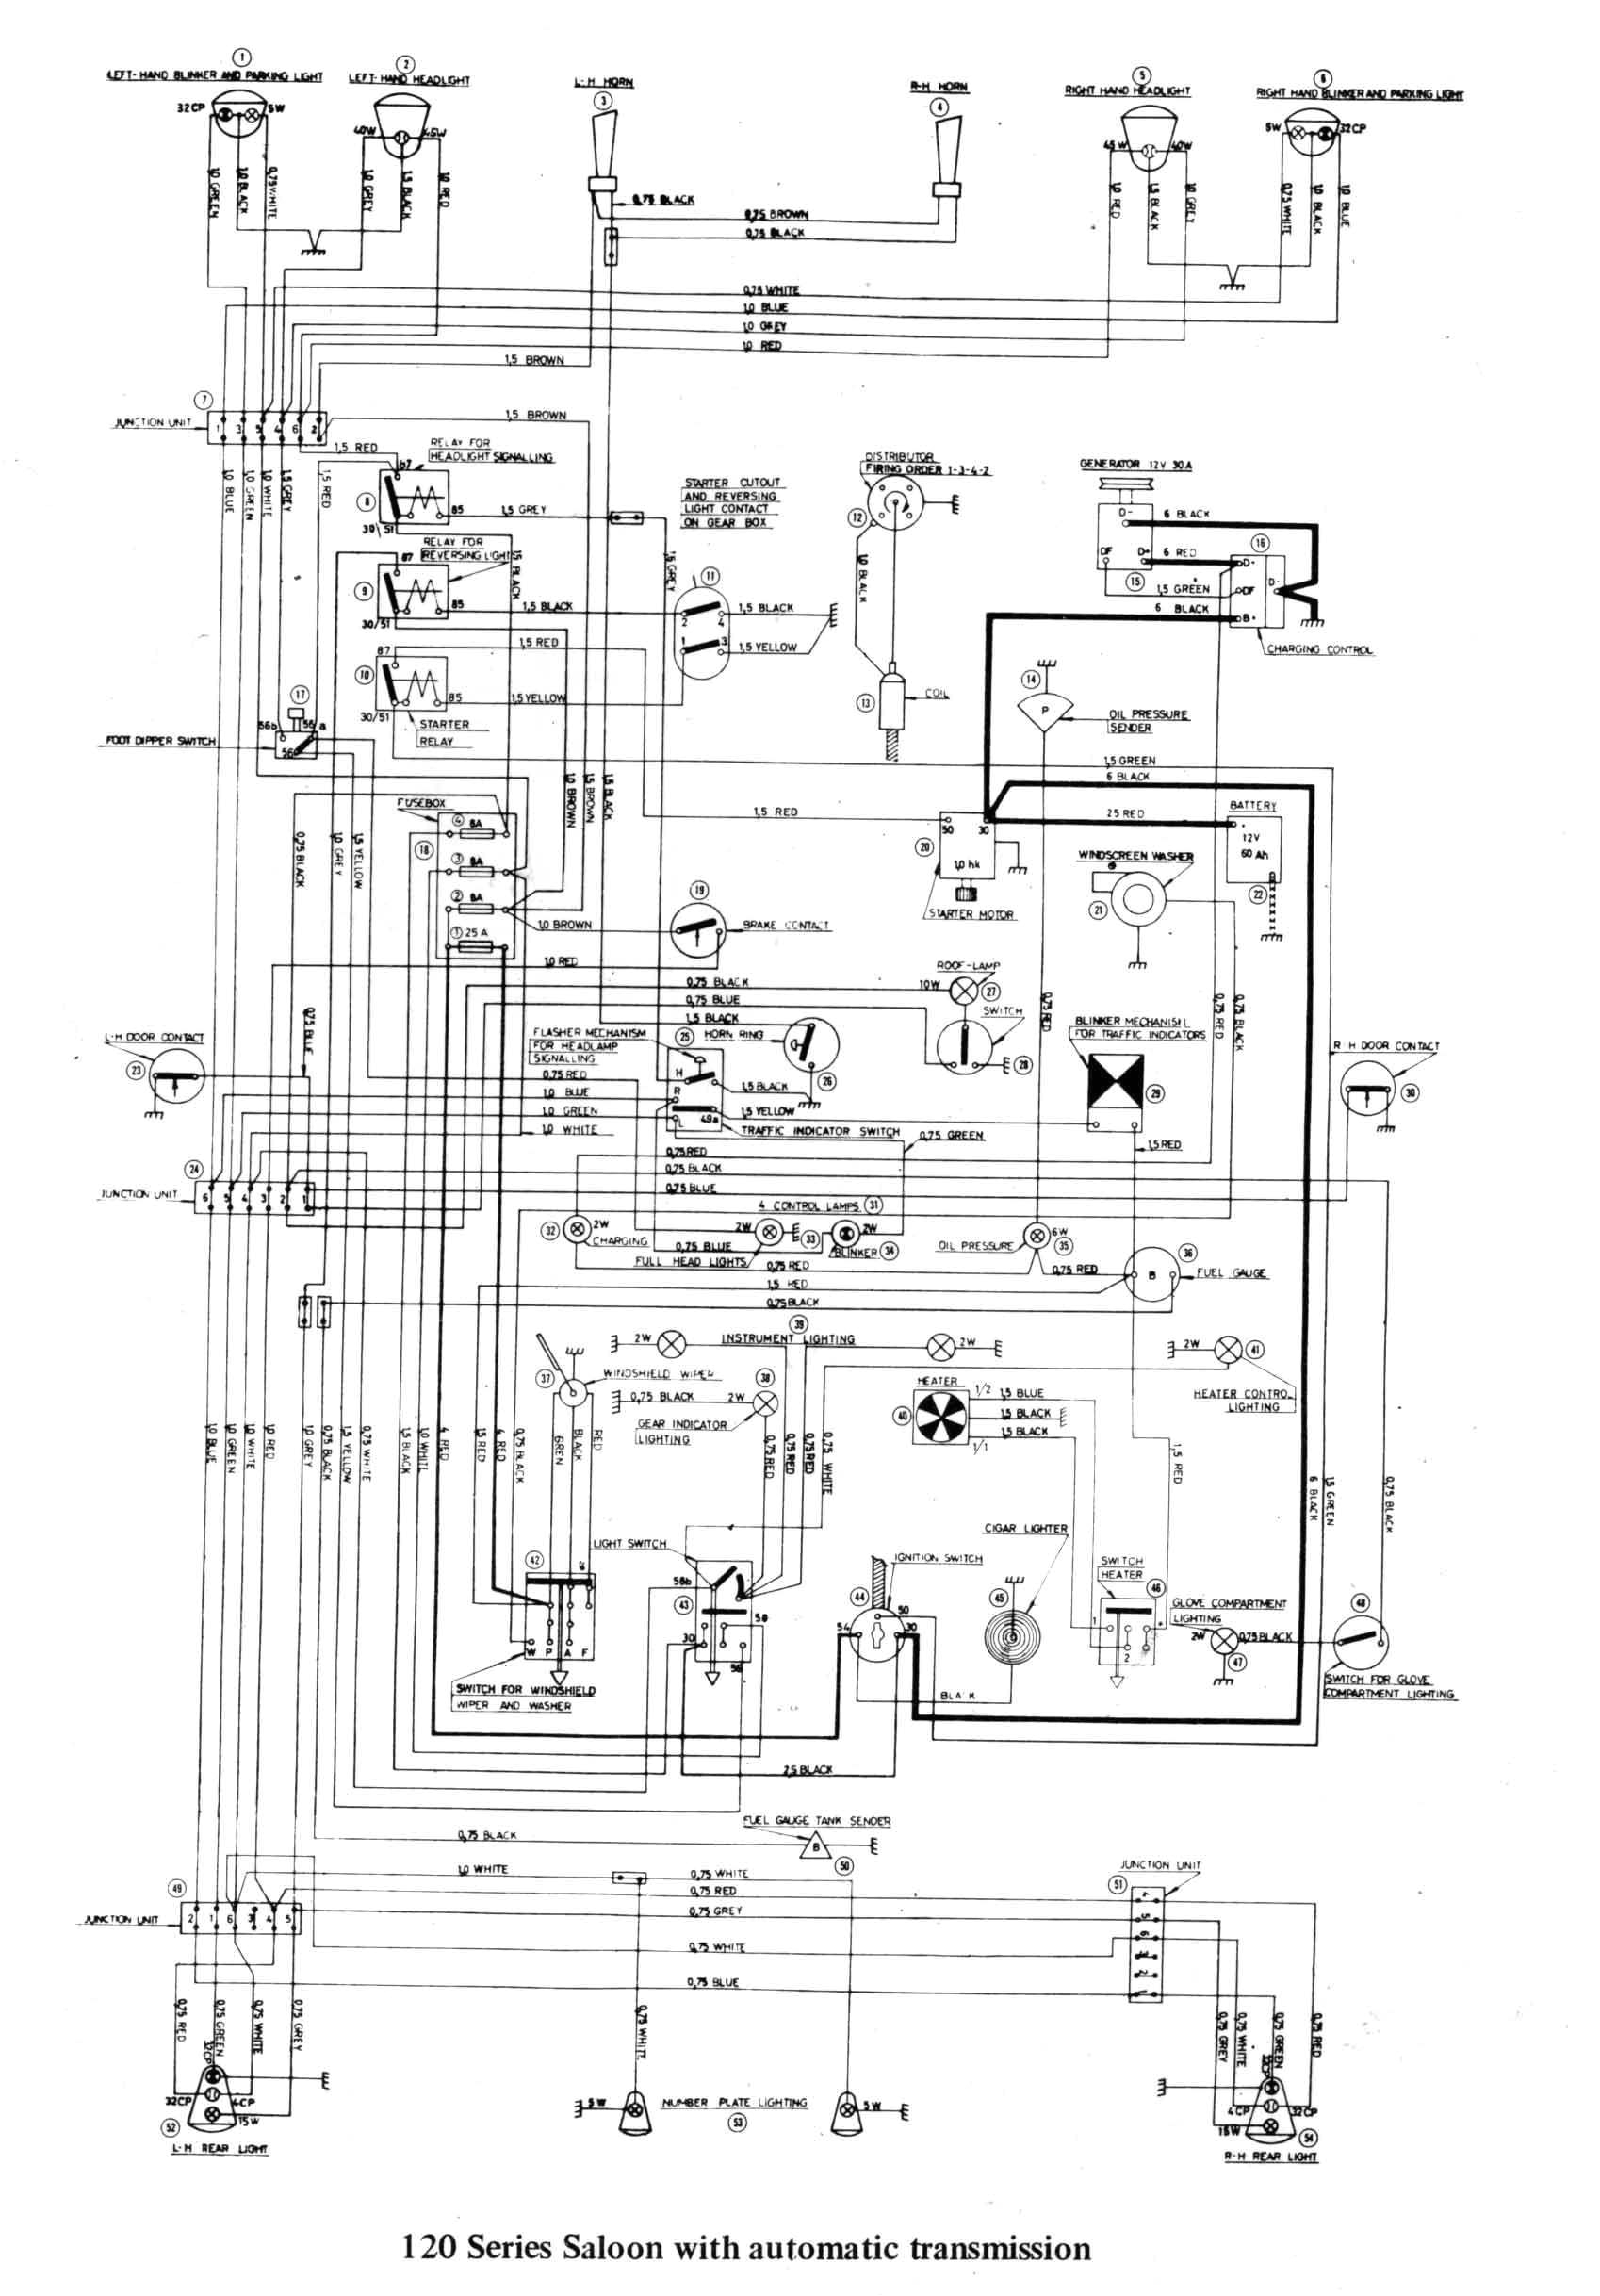 Hid Miniprox Wiring Diagram Hid Wiring Diagrams Wiring Diagram Schematics